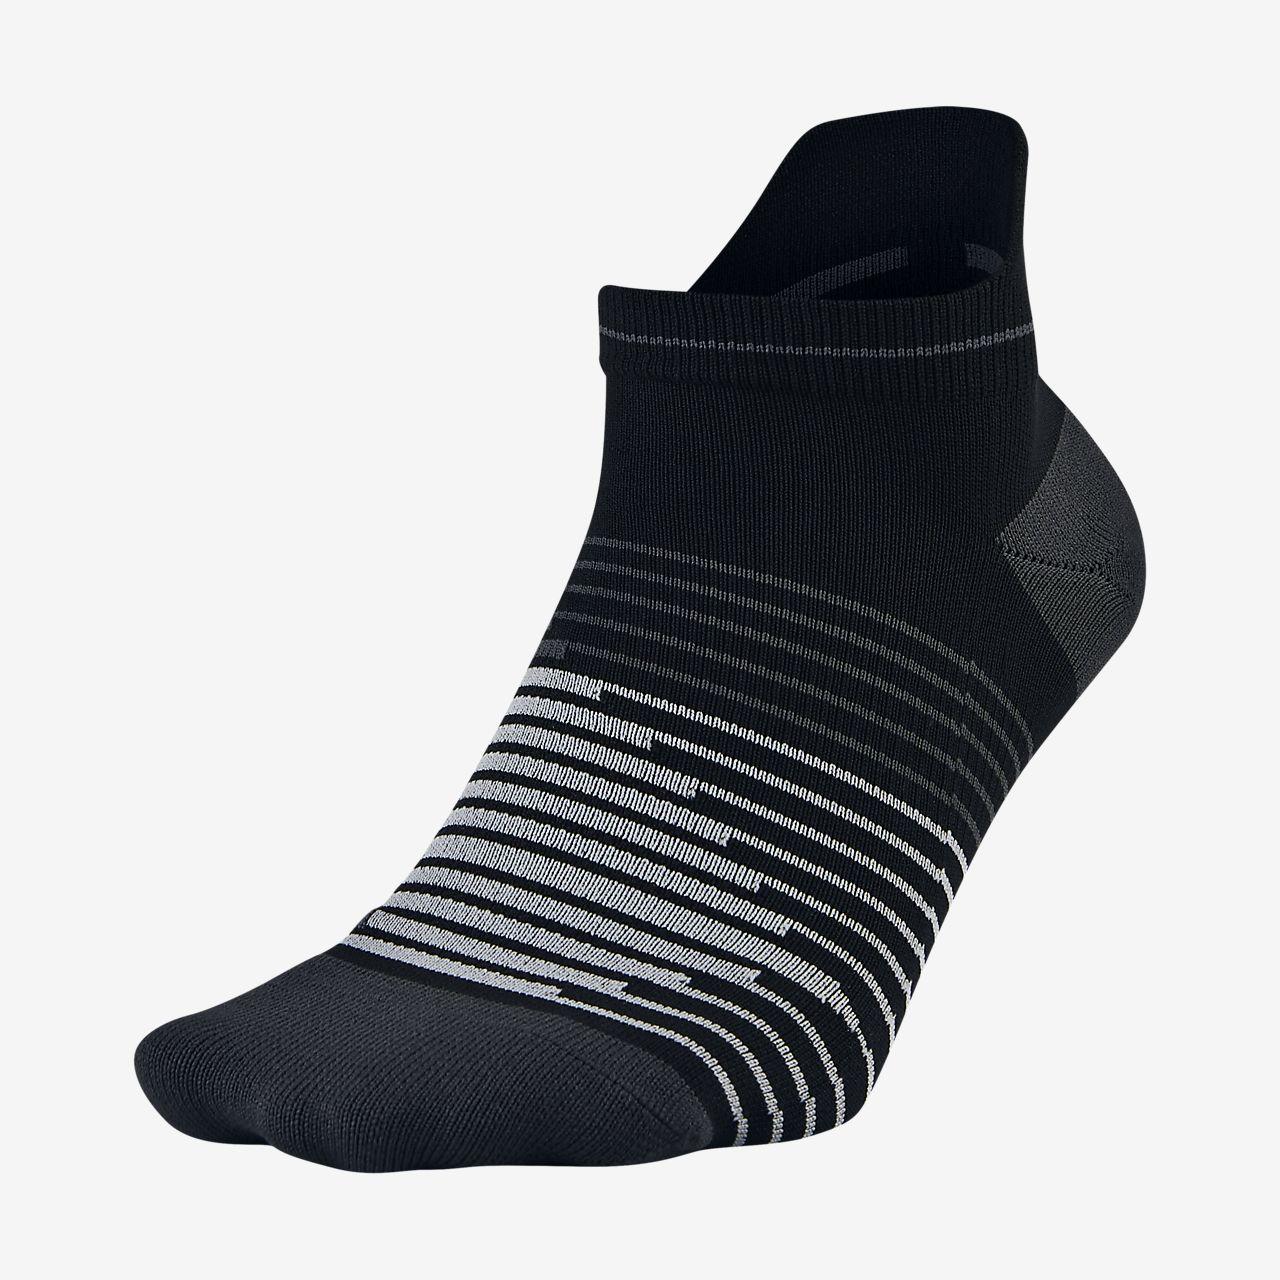 Meias de running Nike Dri-FIT Lightweight No-Show Tab